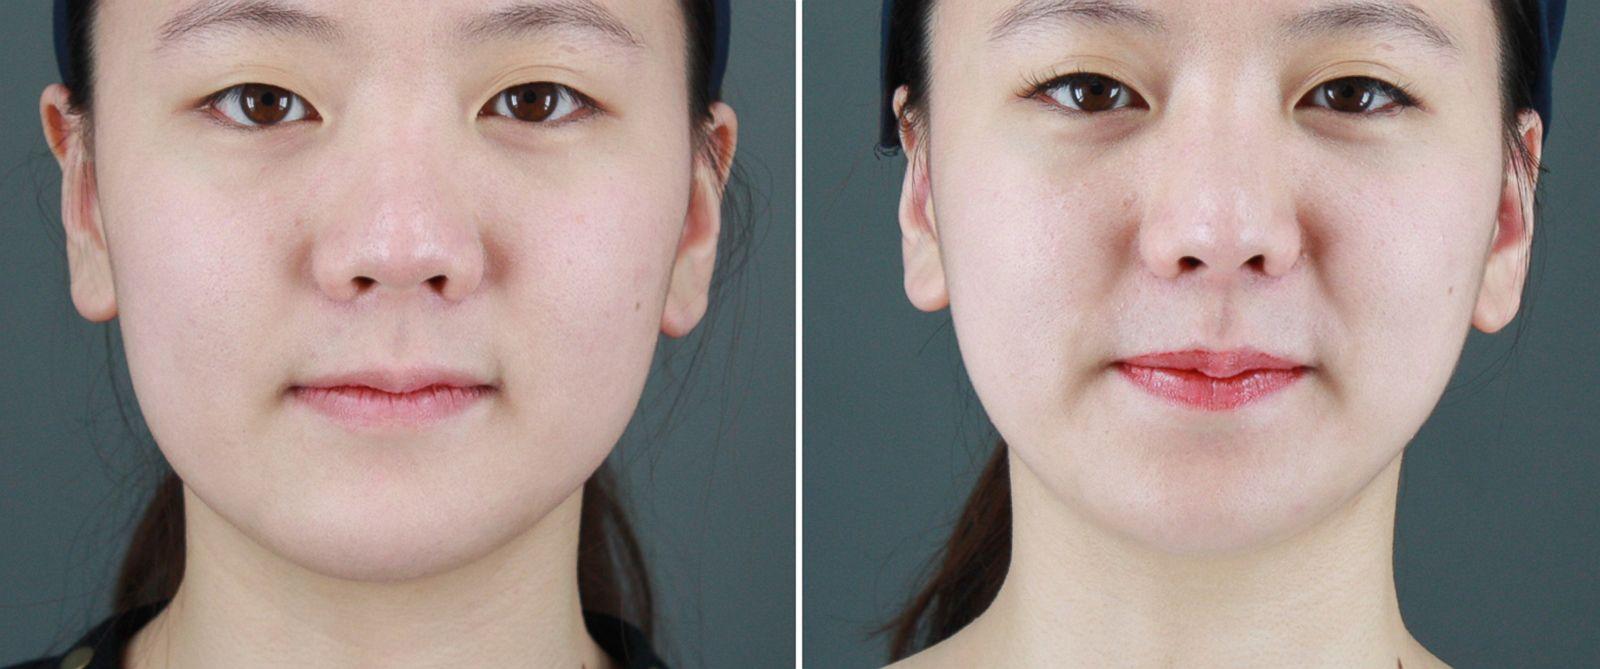 Facial plastic surgery procedures think, that